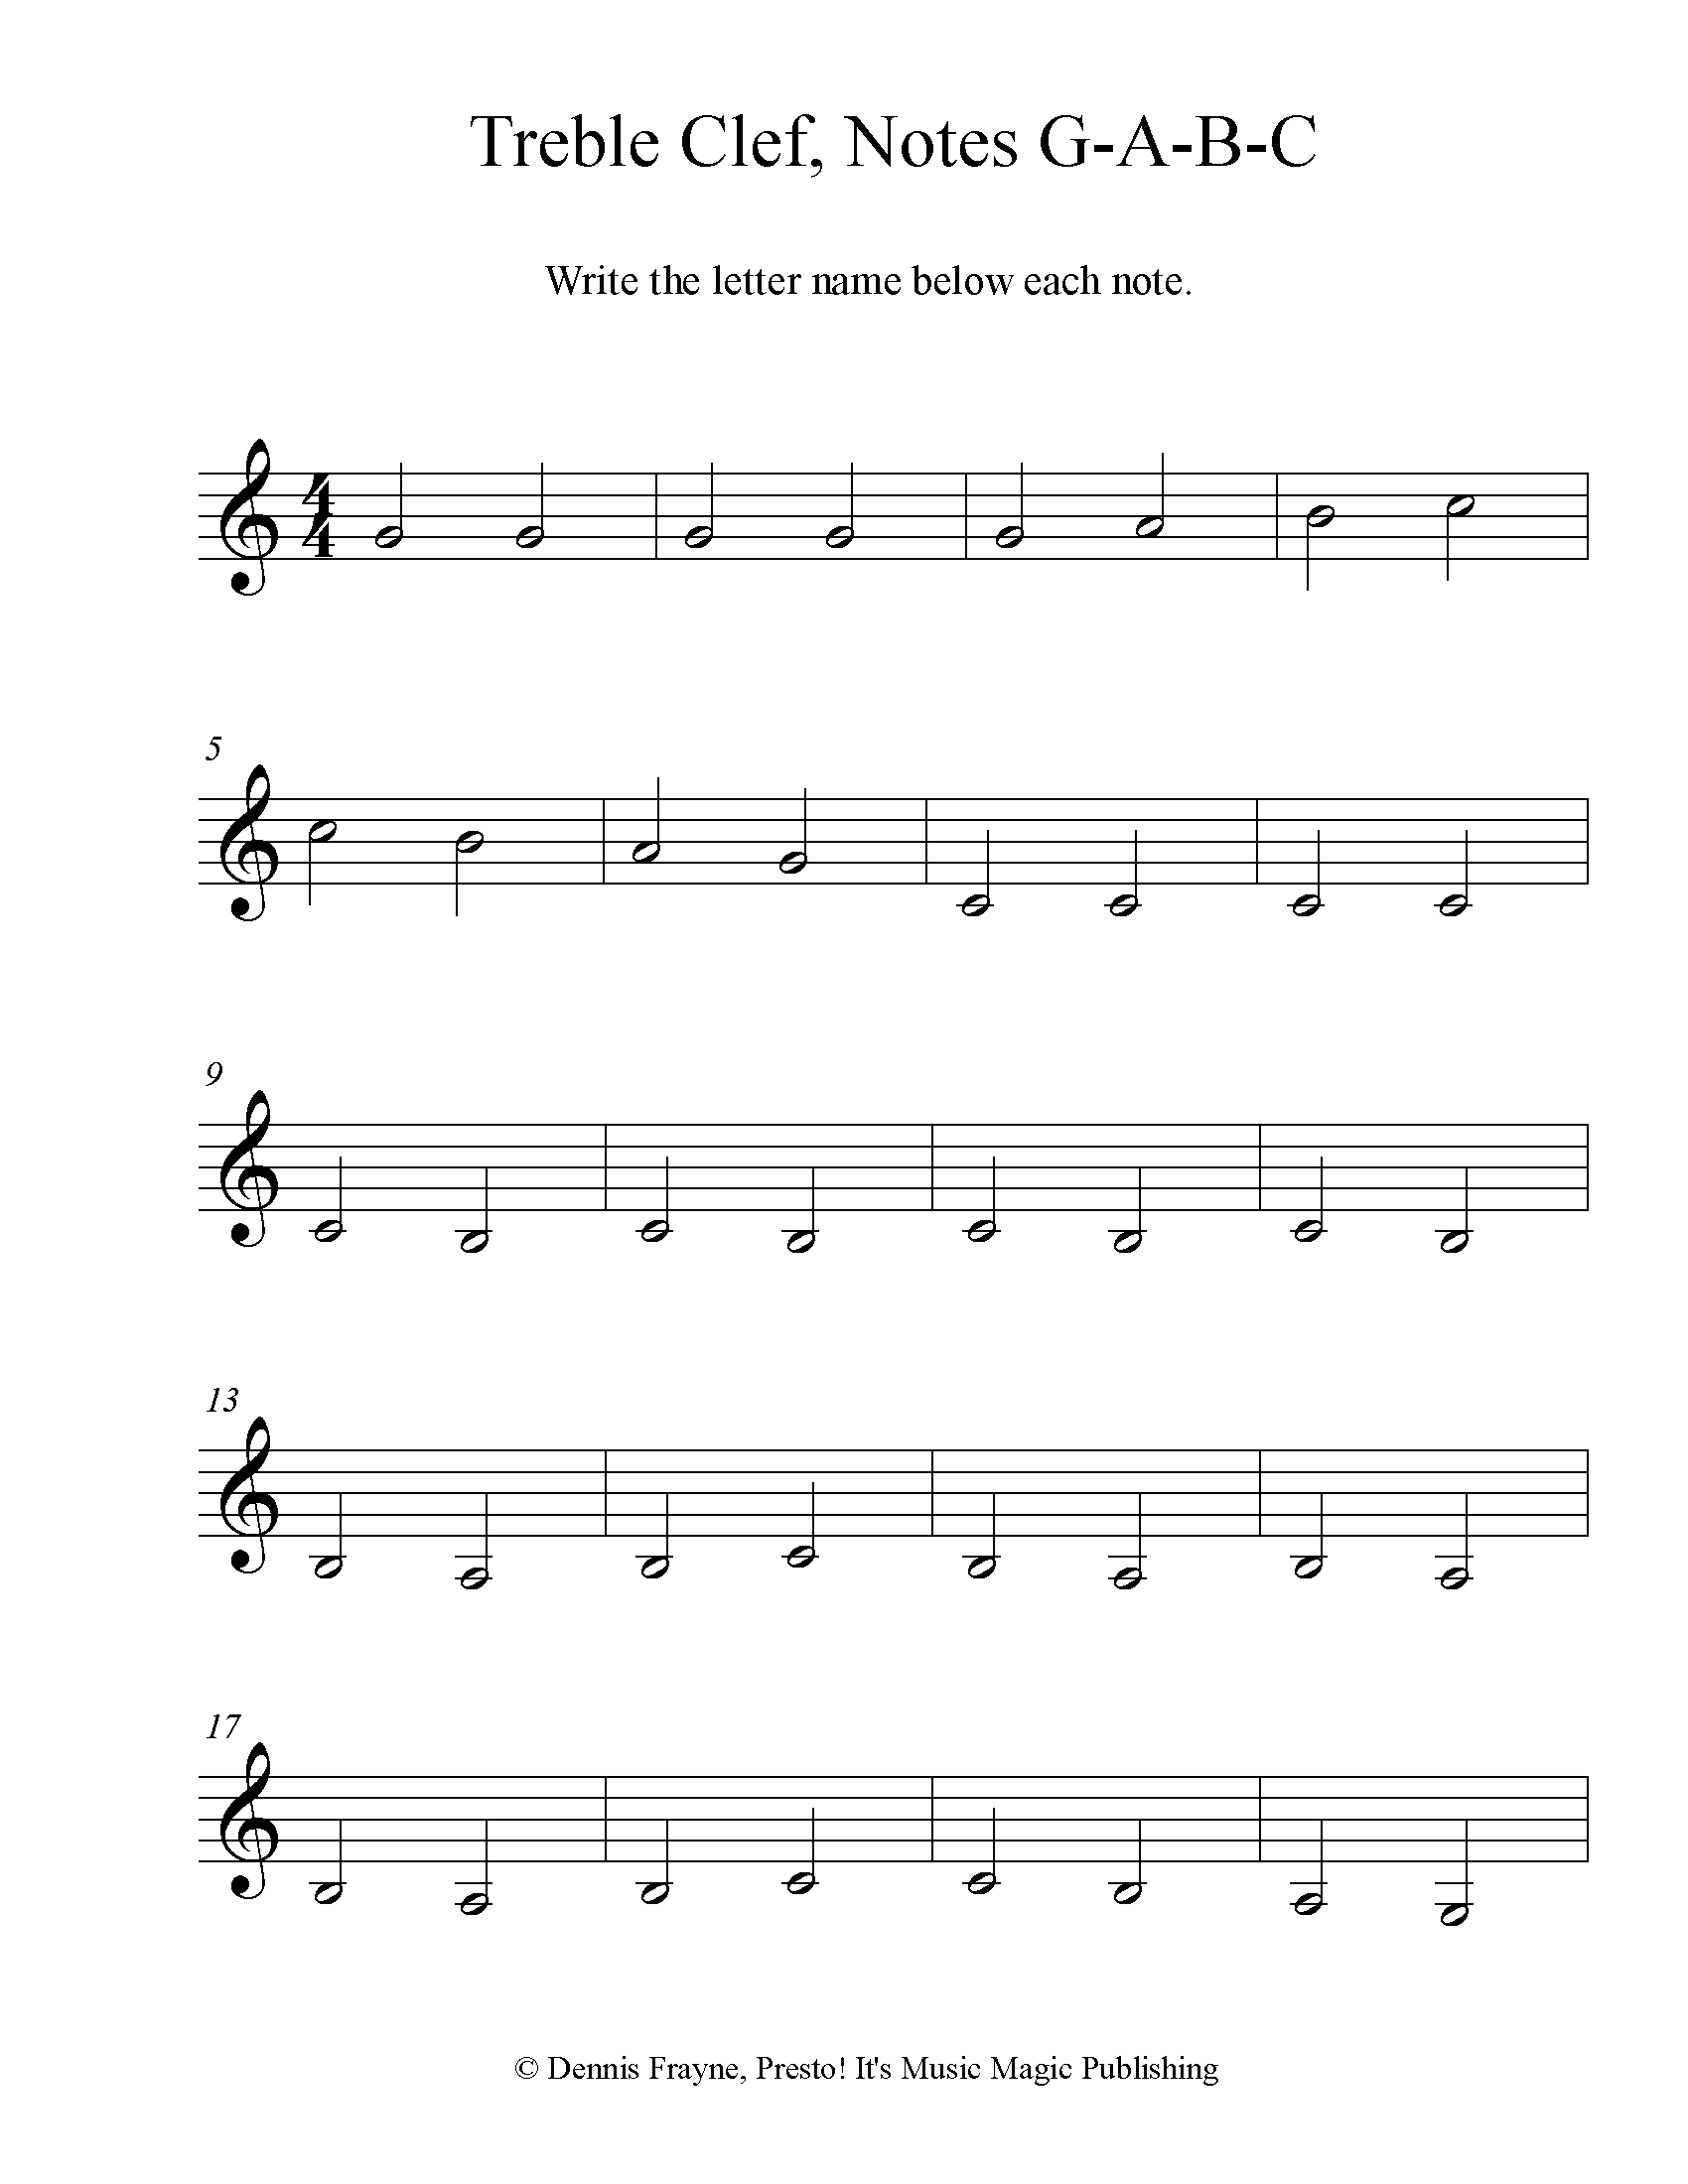 FREE! Printable Music Note Naming Worksheets — Presto! It's ...